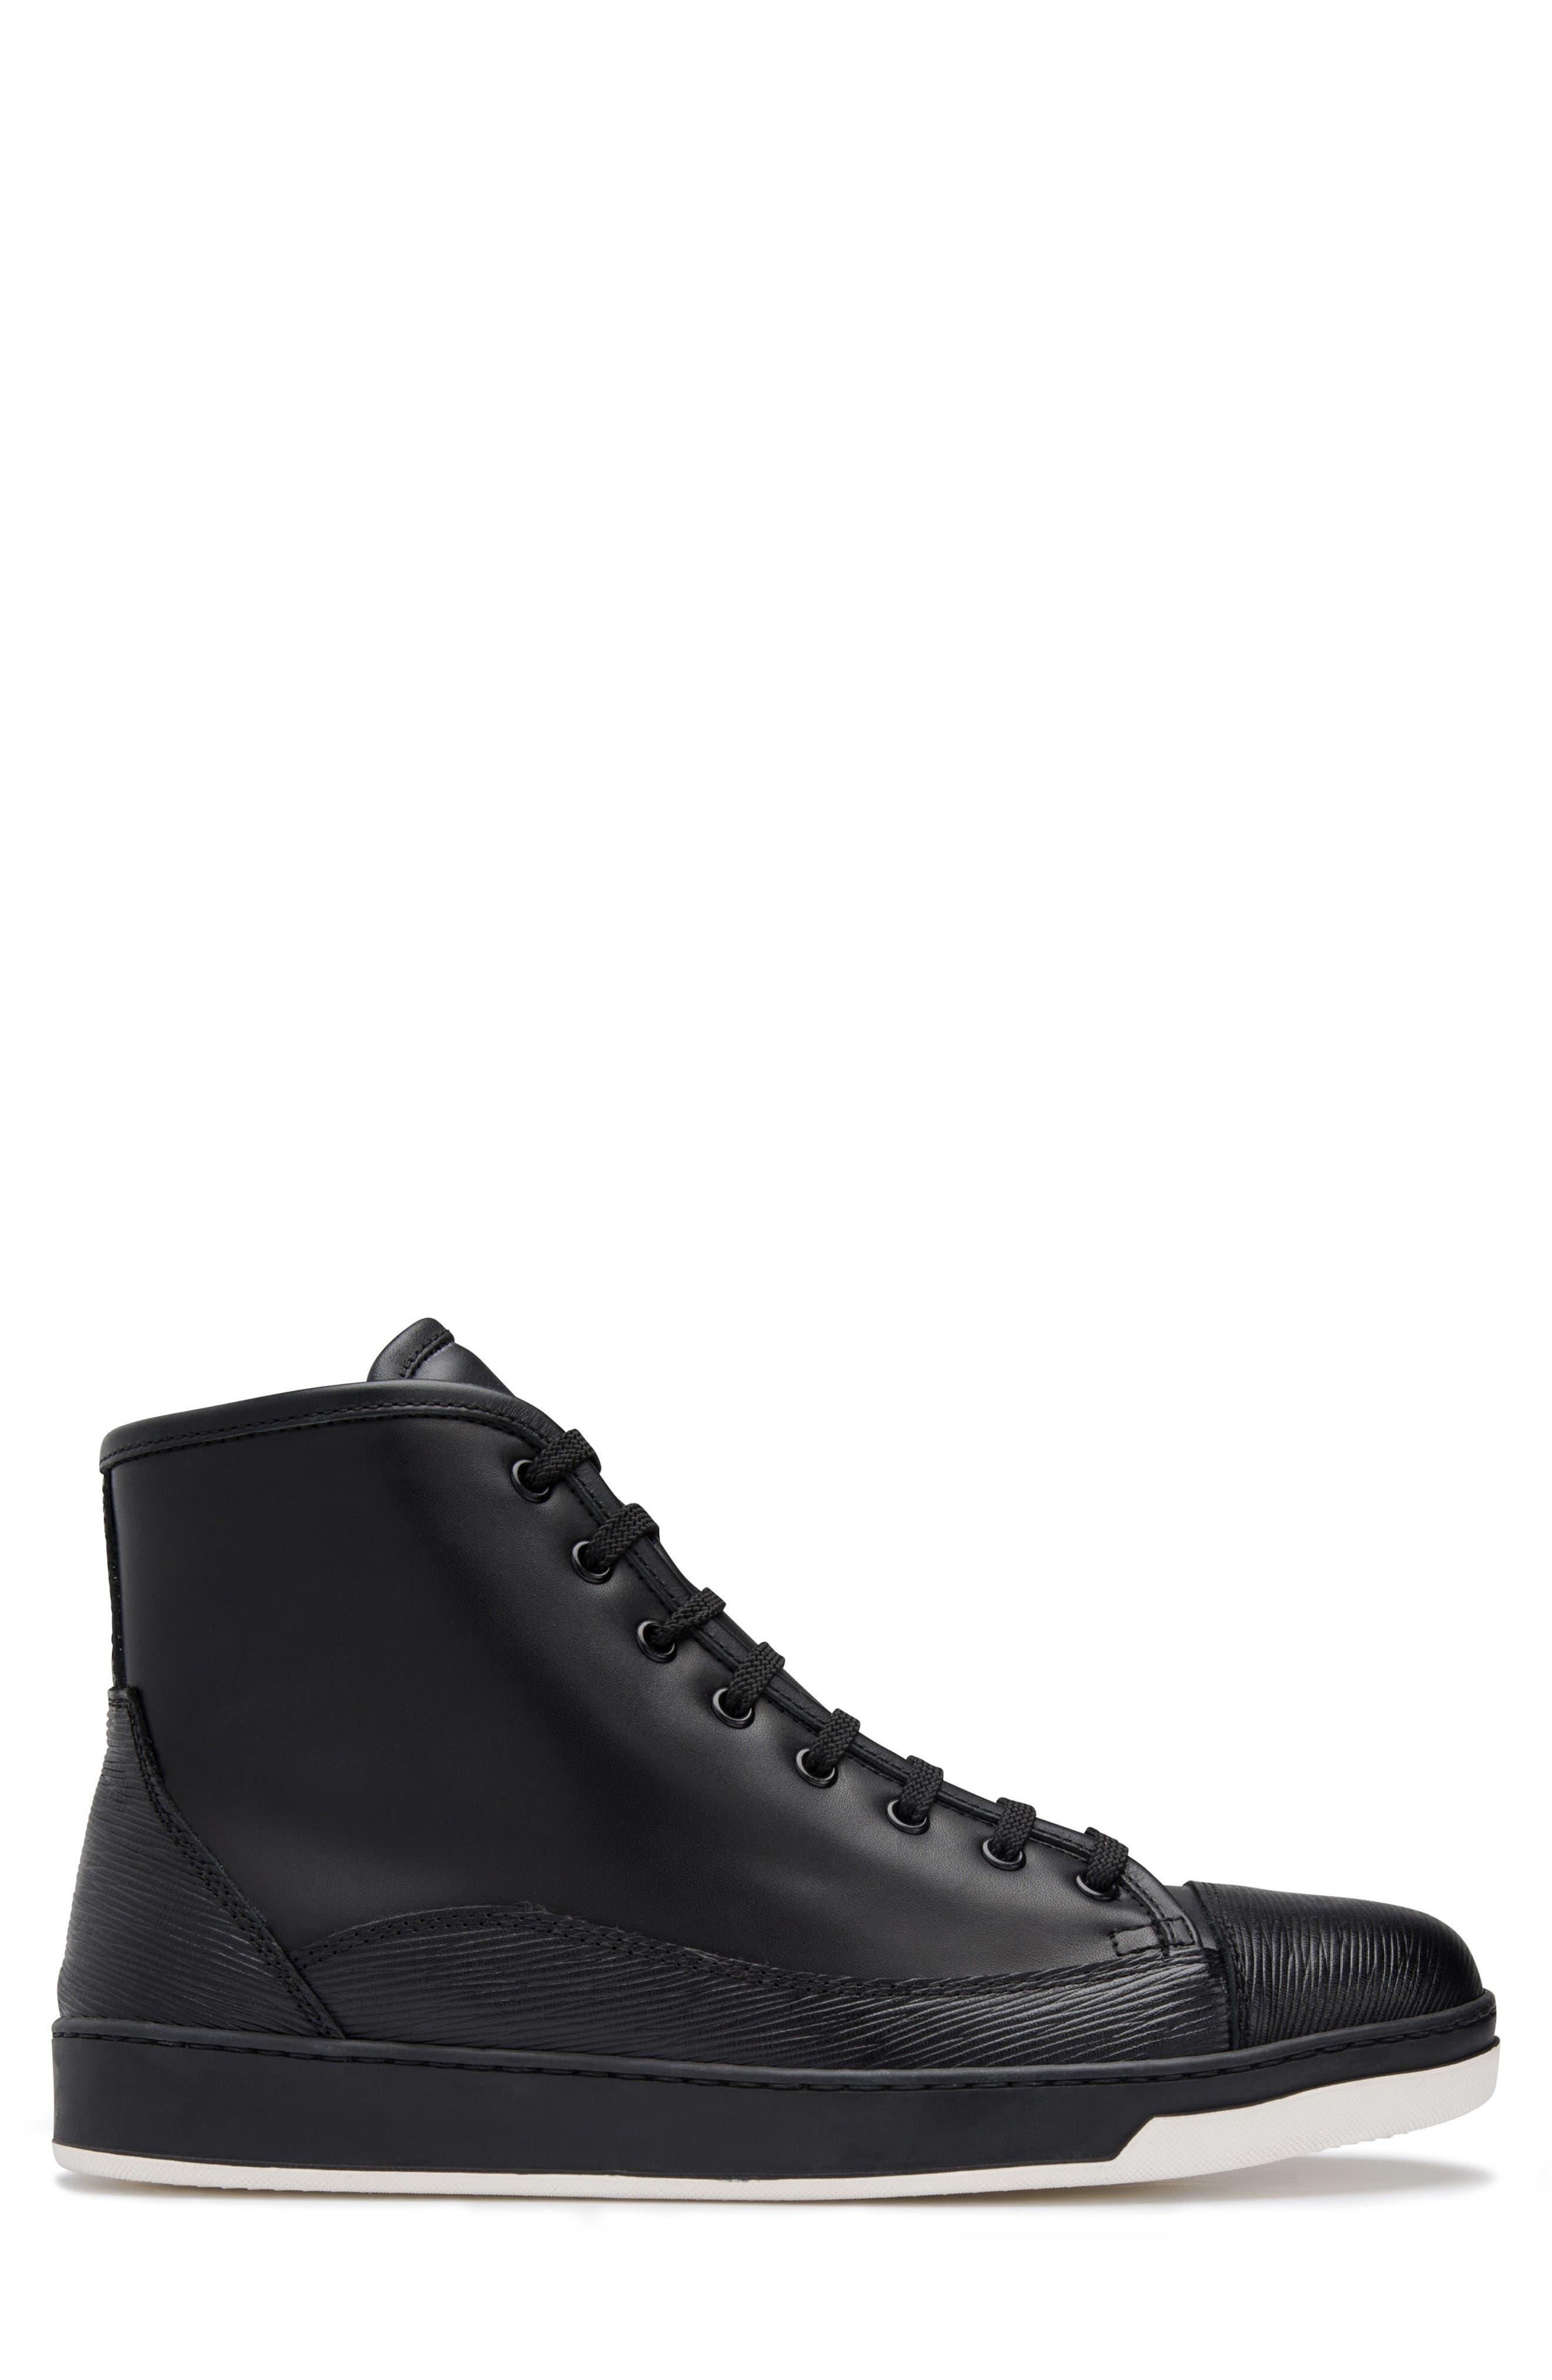 Livorno High Top Sneaker,                             Alternate thumbnail 3, color,                             NERO